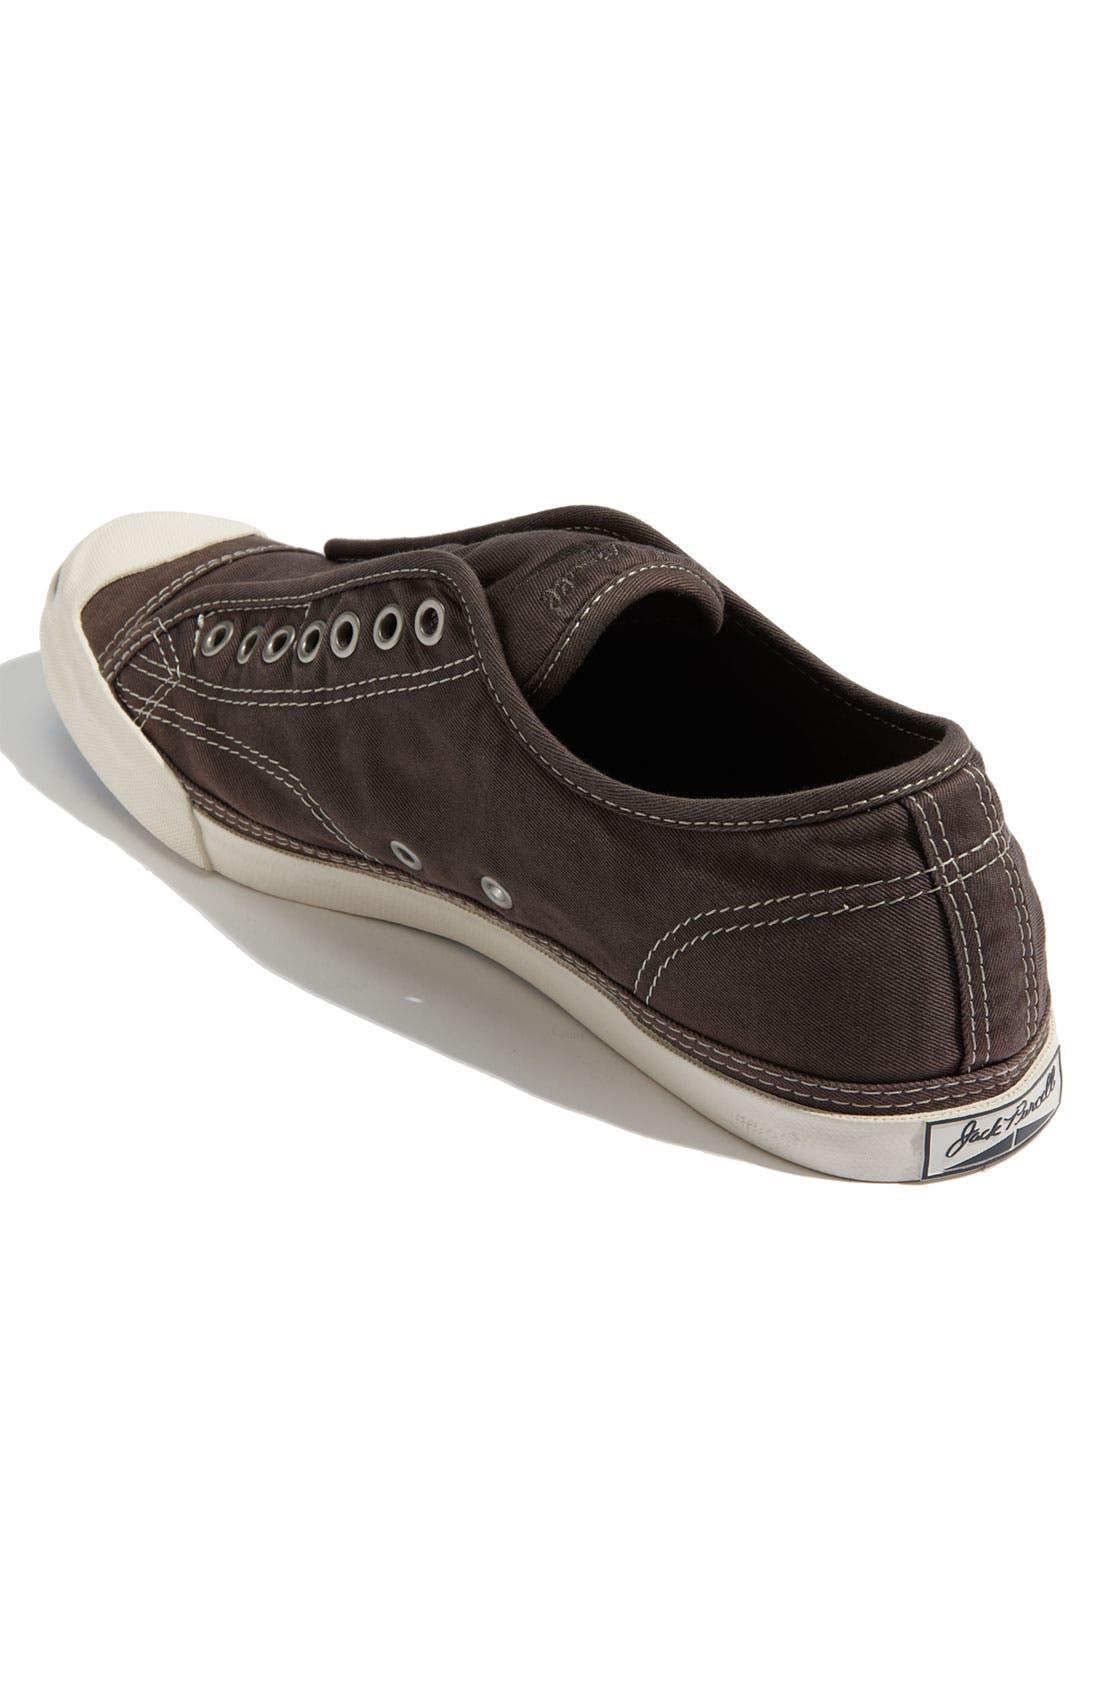 Alternate Image 2  - Converse 'Jack Purcell LP' Slip-On Sneaker (Men)